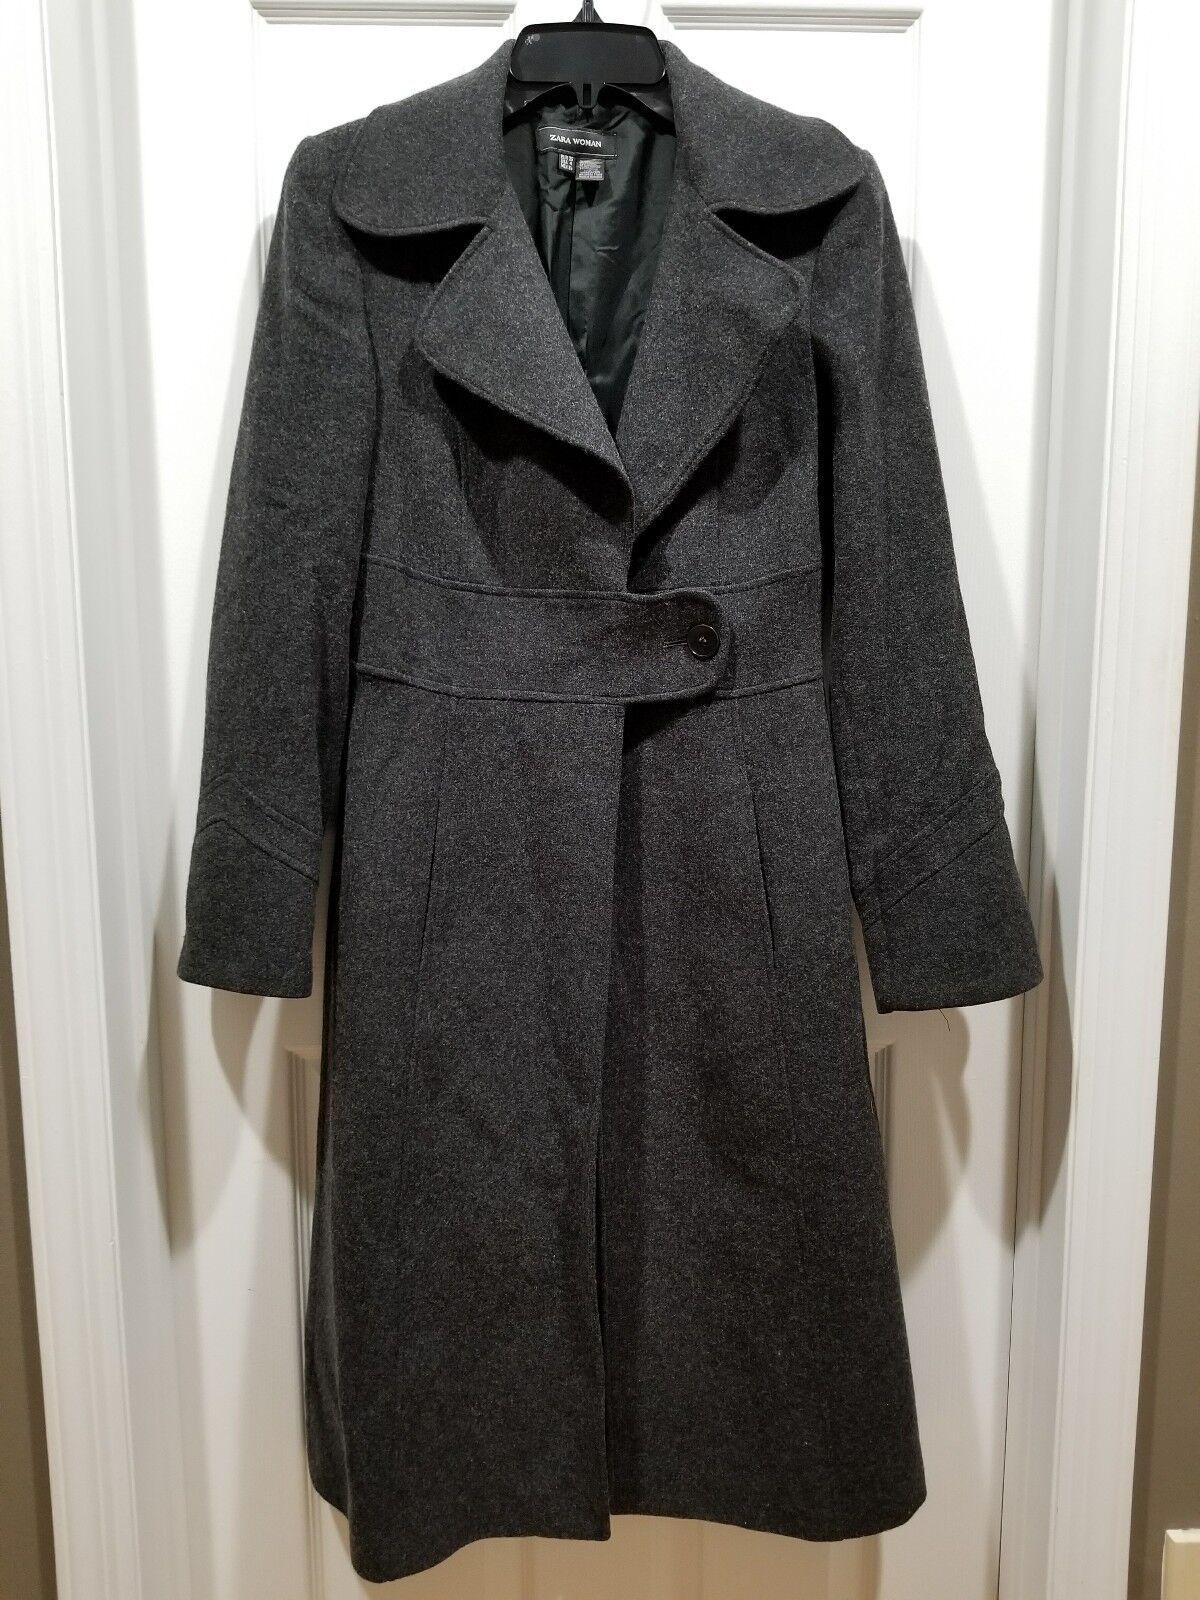 Zara grå Long Wool Blend Coat Sz 4